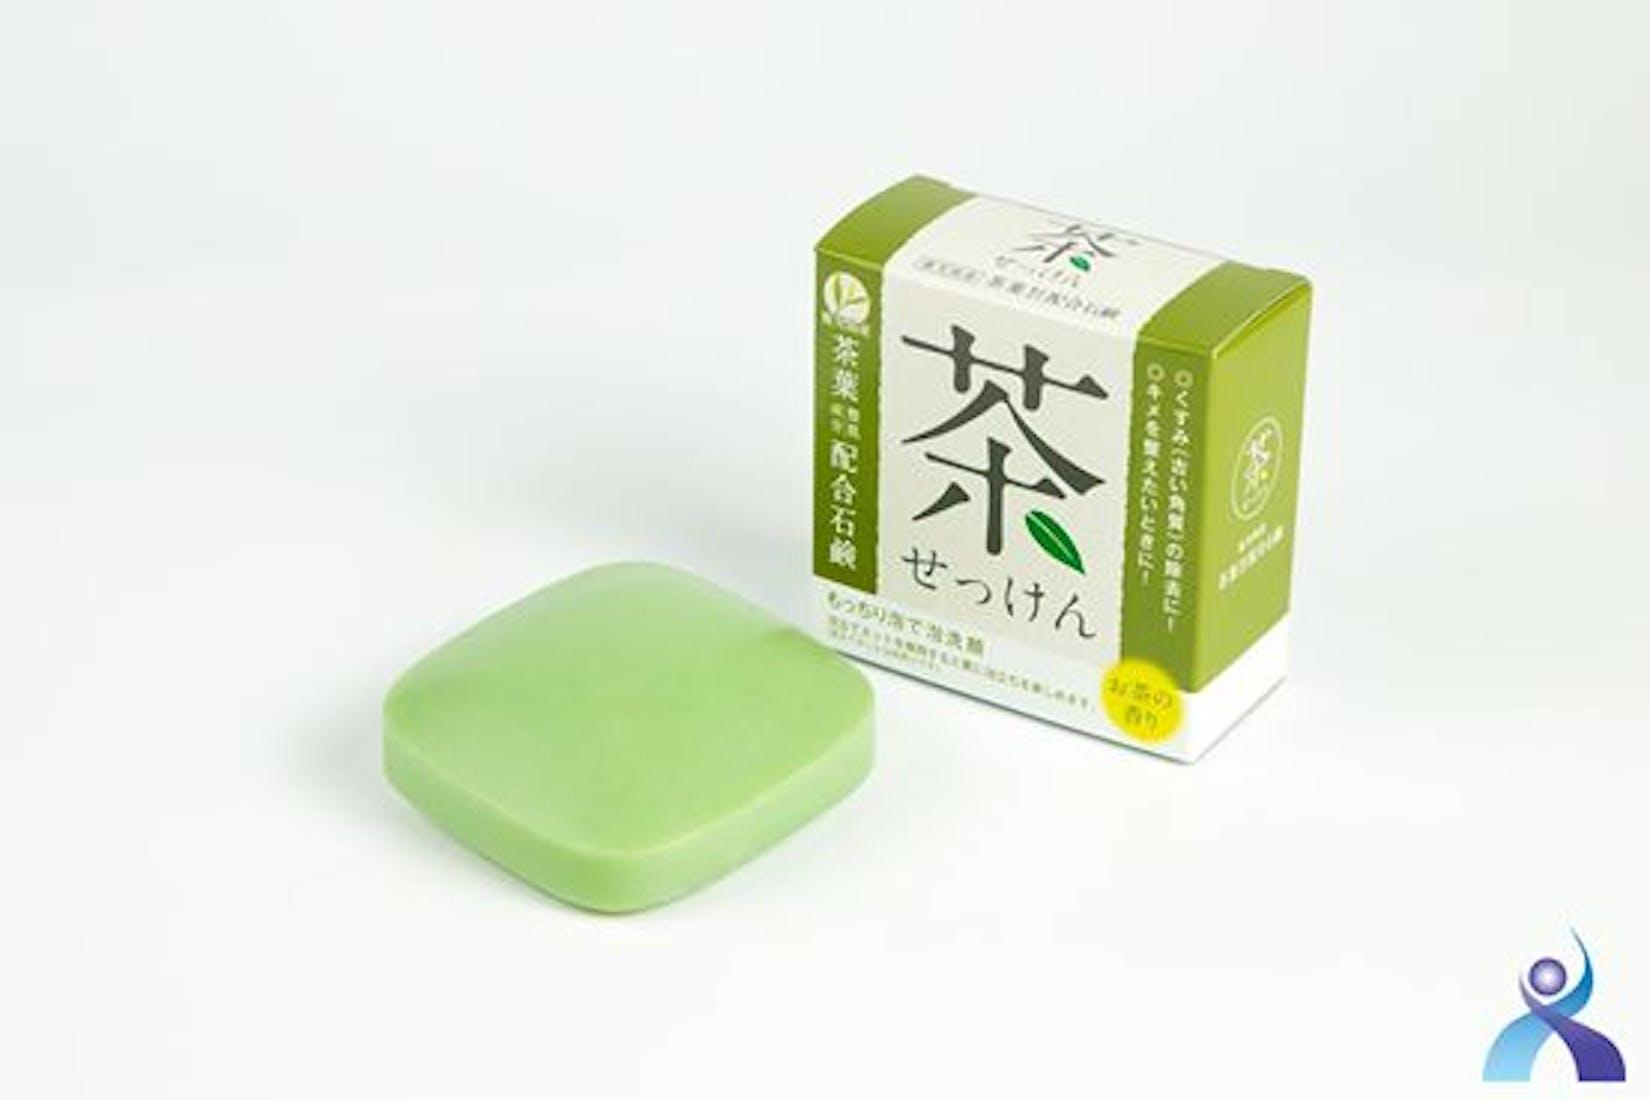 Clover Soap | Beauty